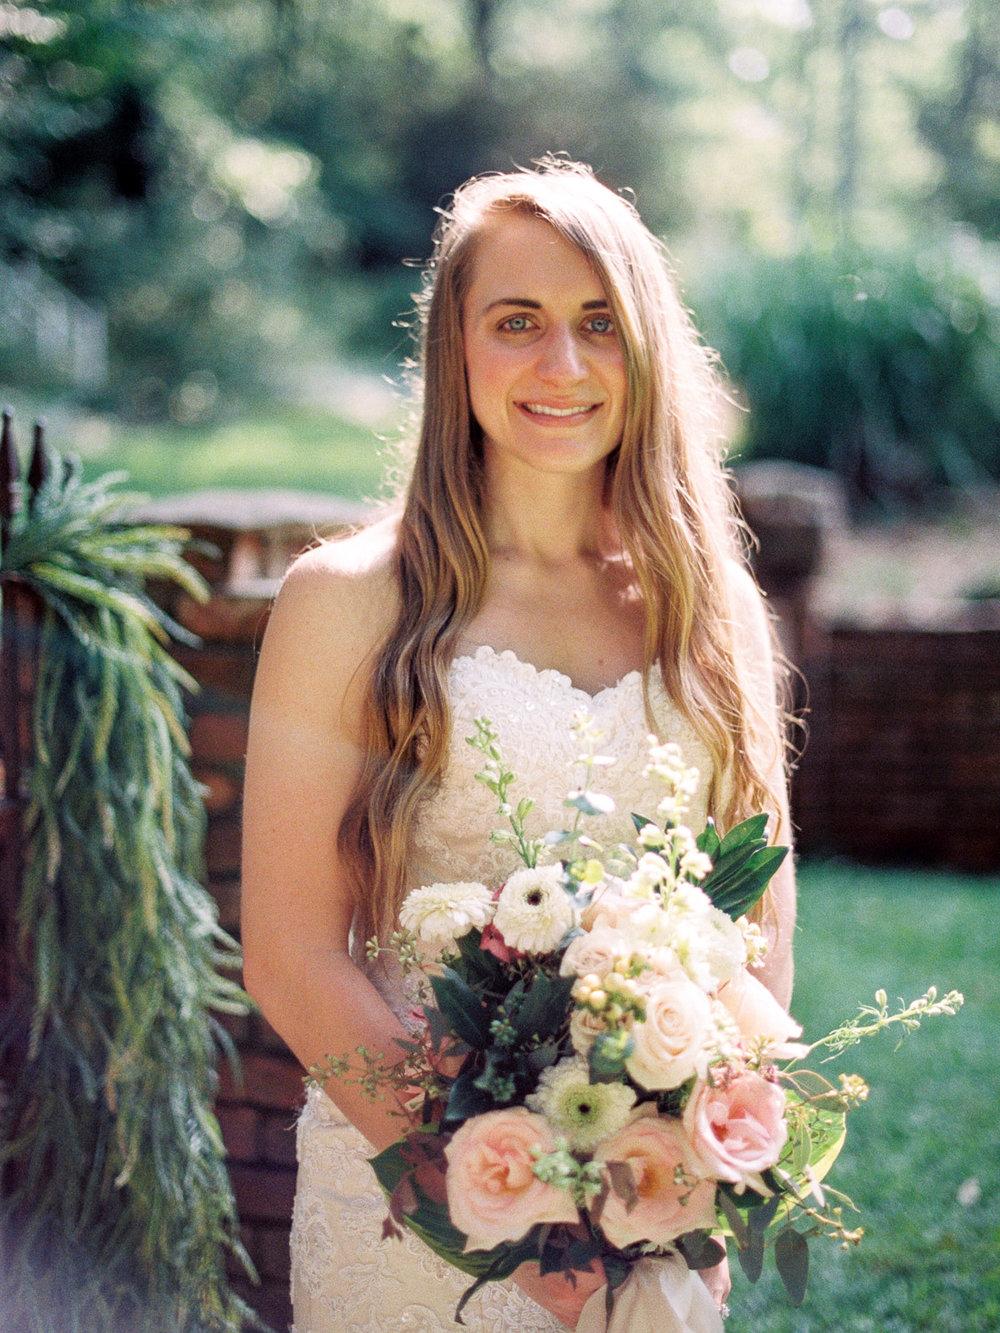 christinadavisphotography-romanticwedding-gardenweddinginspiration43.jpg